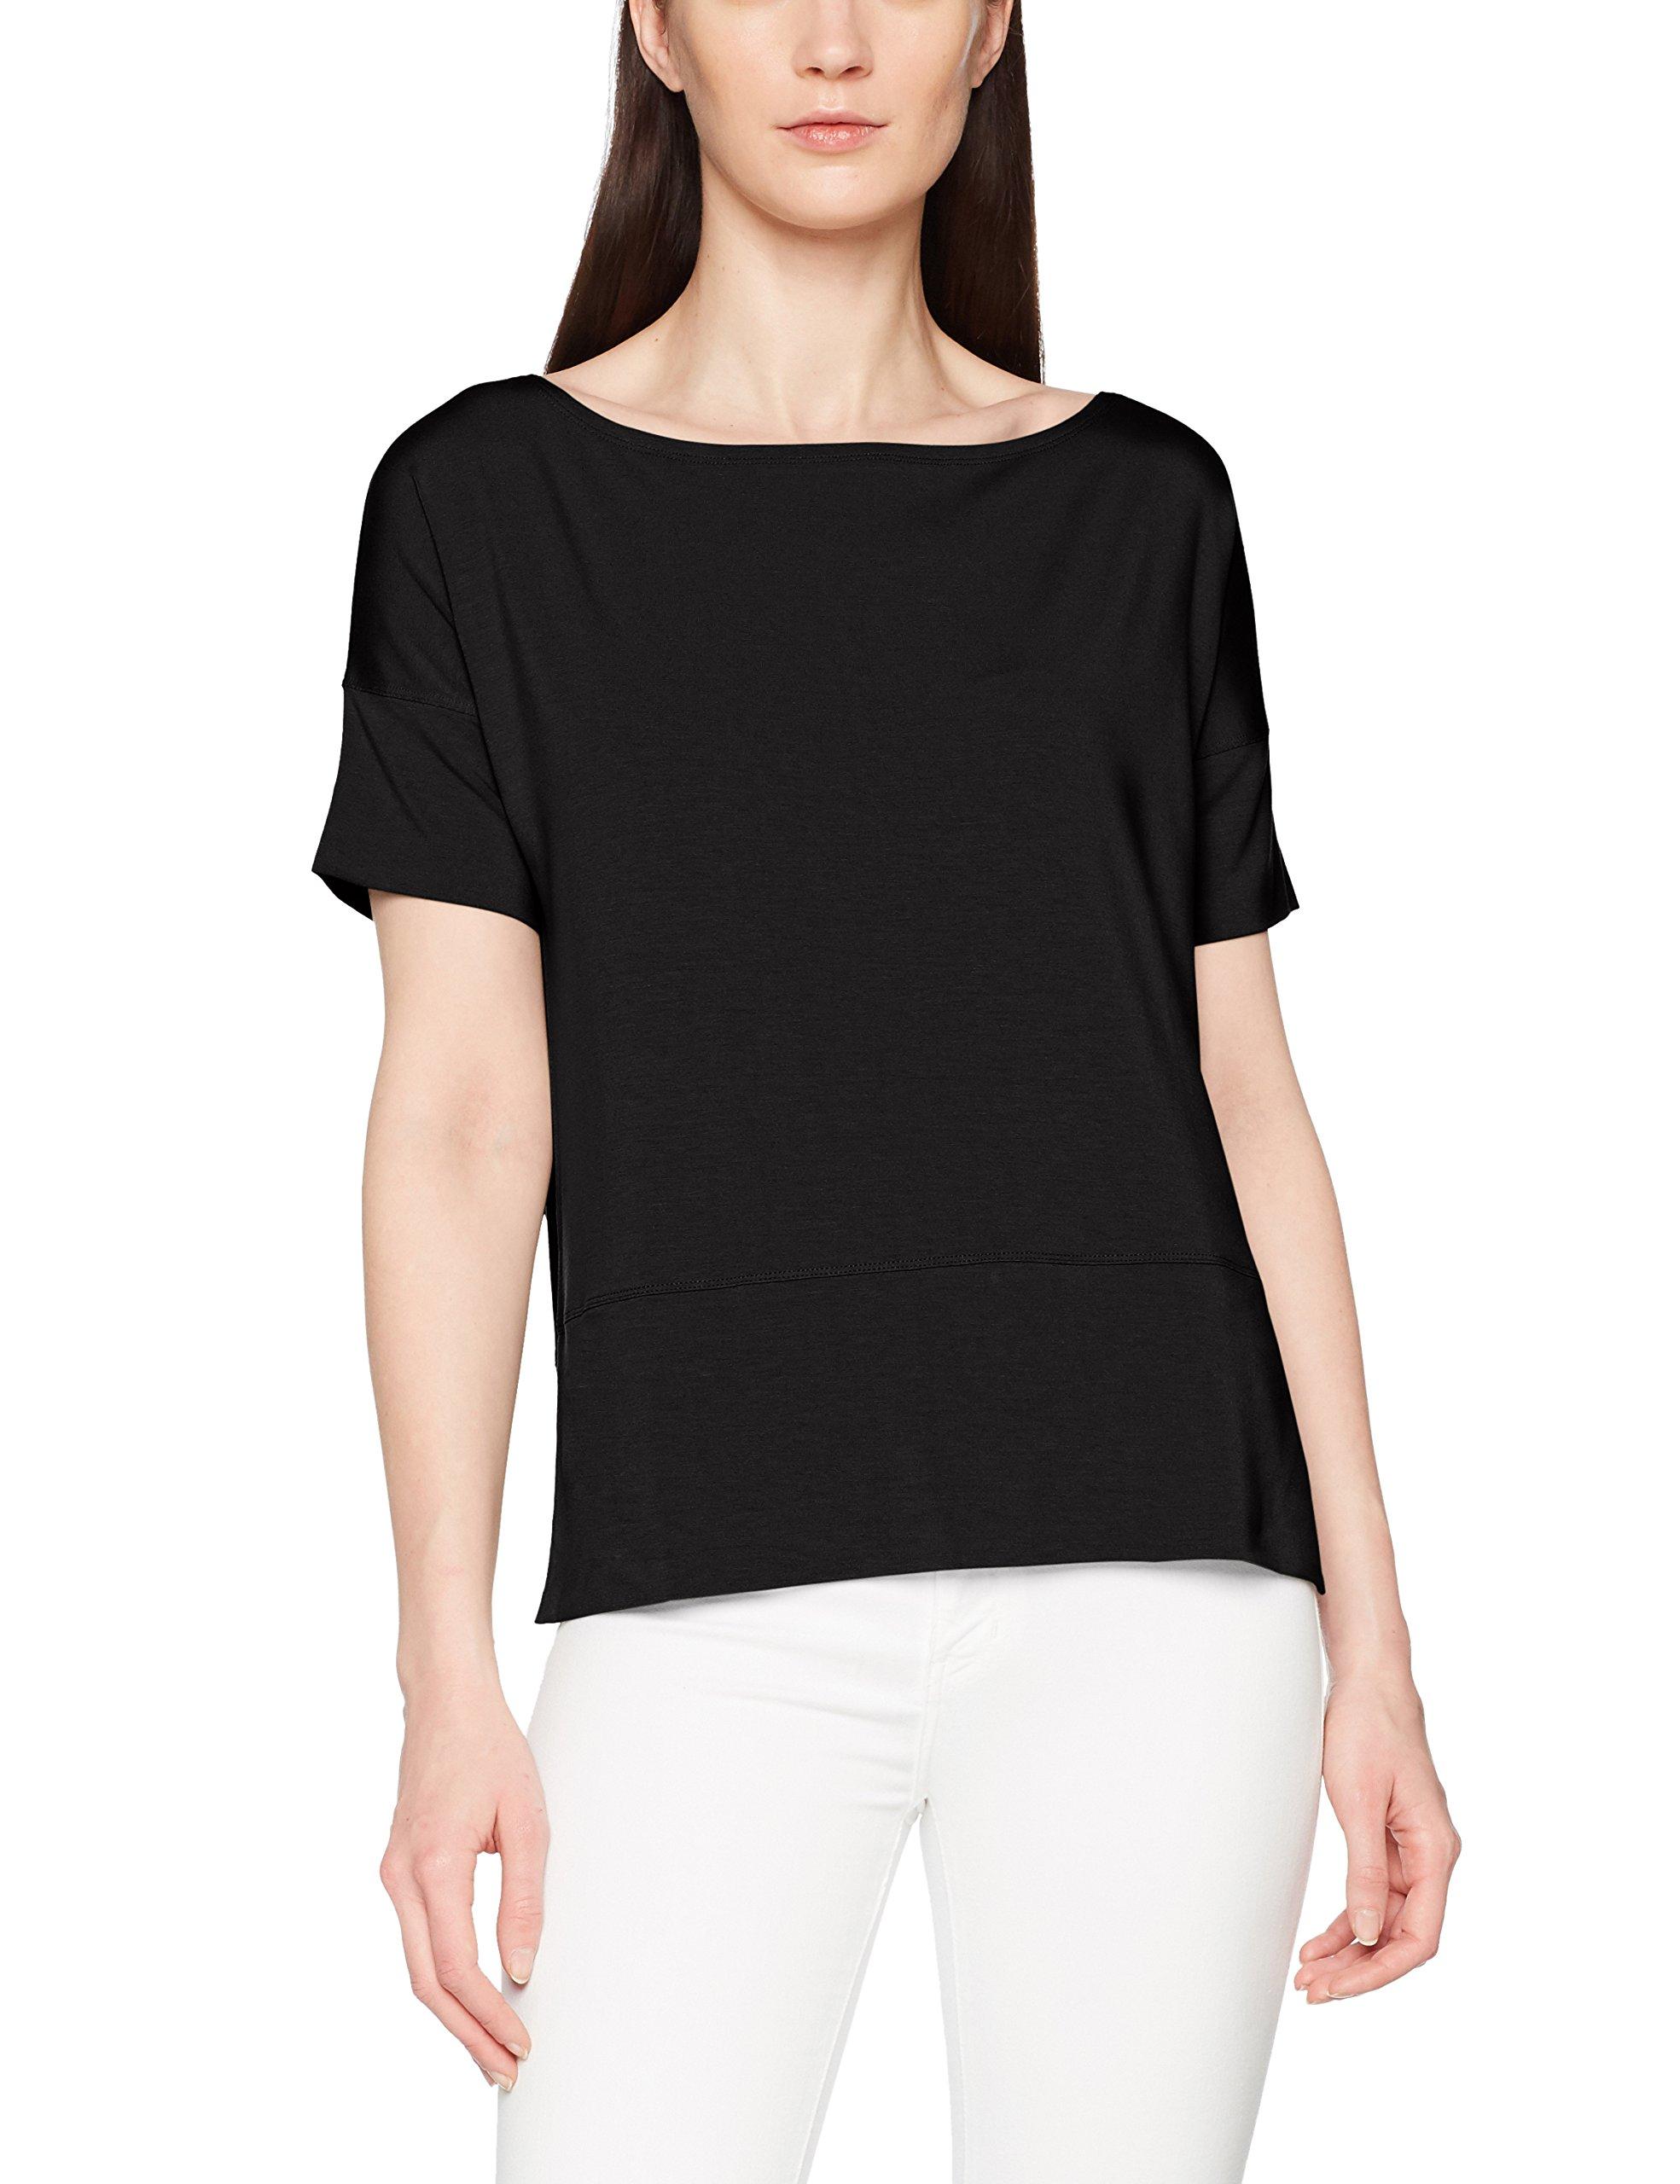 Blaumax shirt FemmeNoirblack AileenTT 999038taille FabricantS SzVUMp